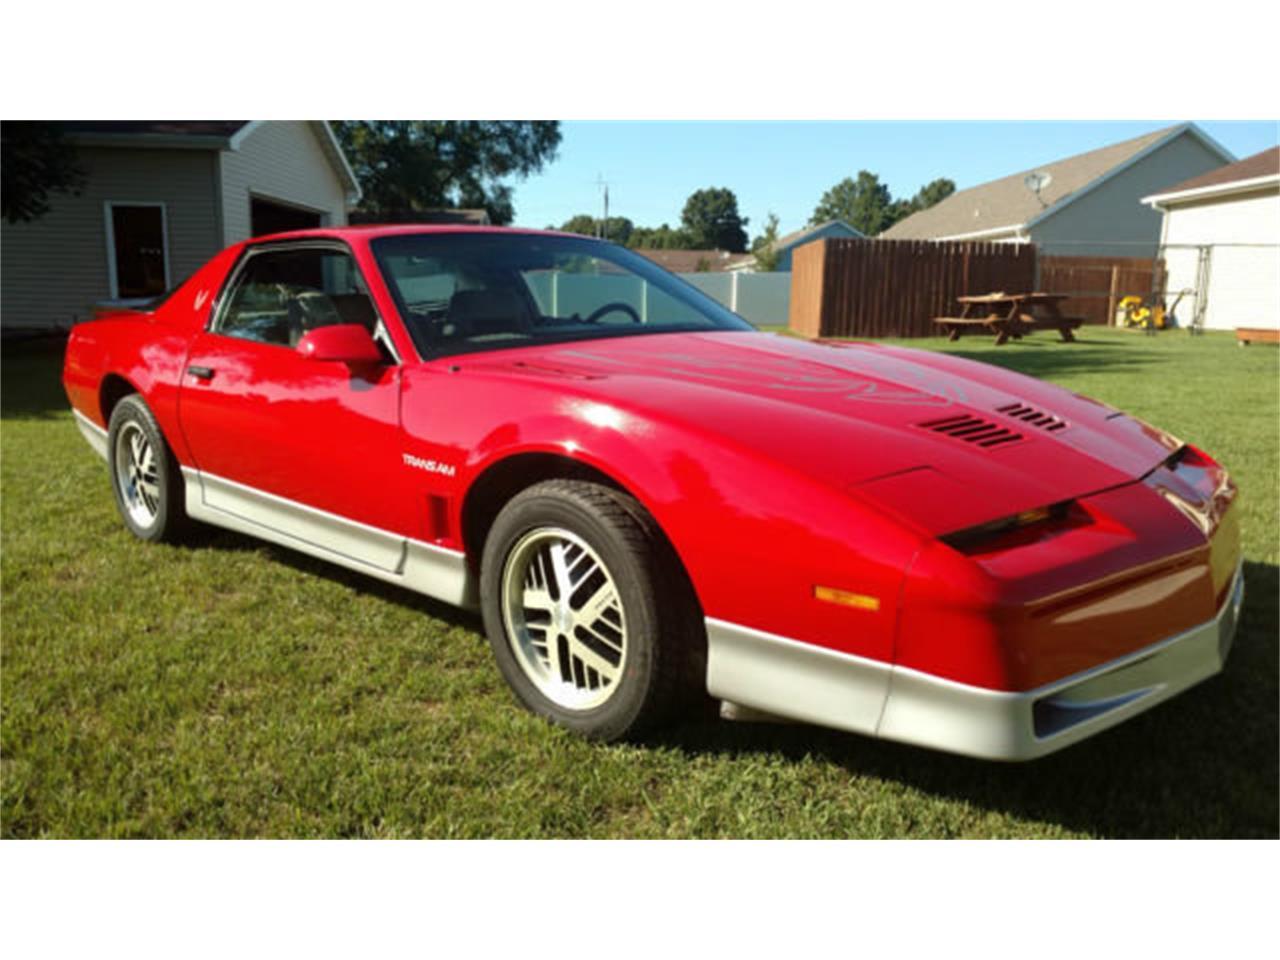 1986 pontiac firebird trans am for sale classiccars com cc 1072621 1986 pontiac firebird trans am for sale